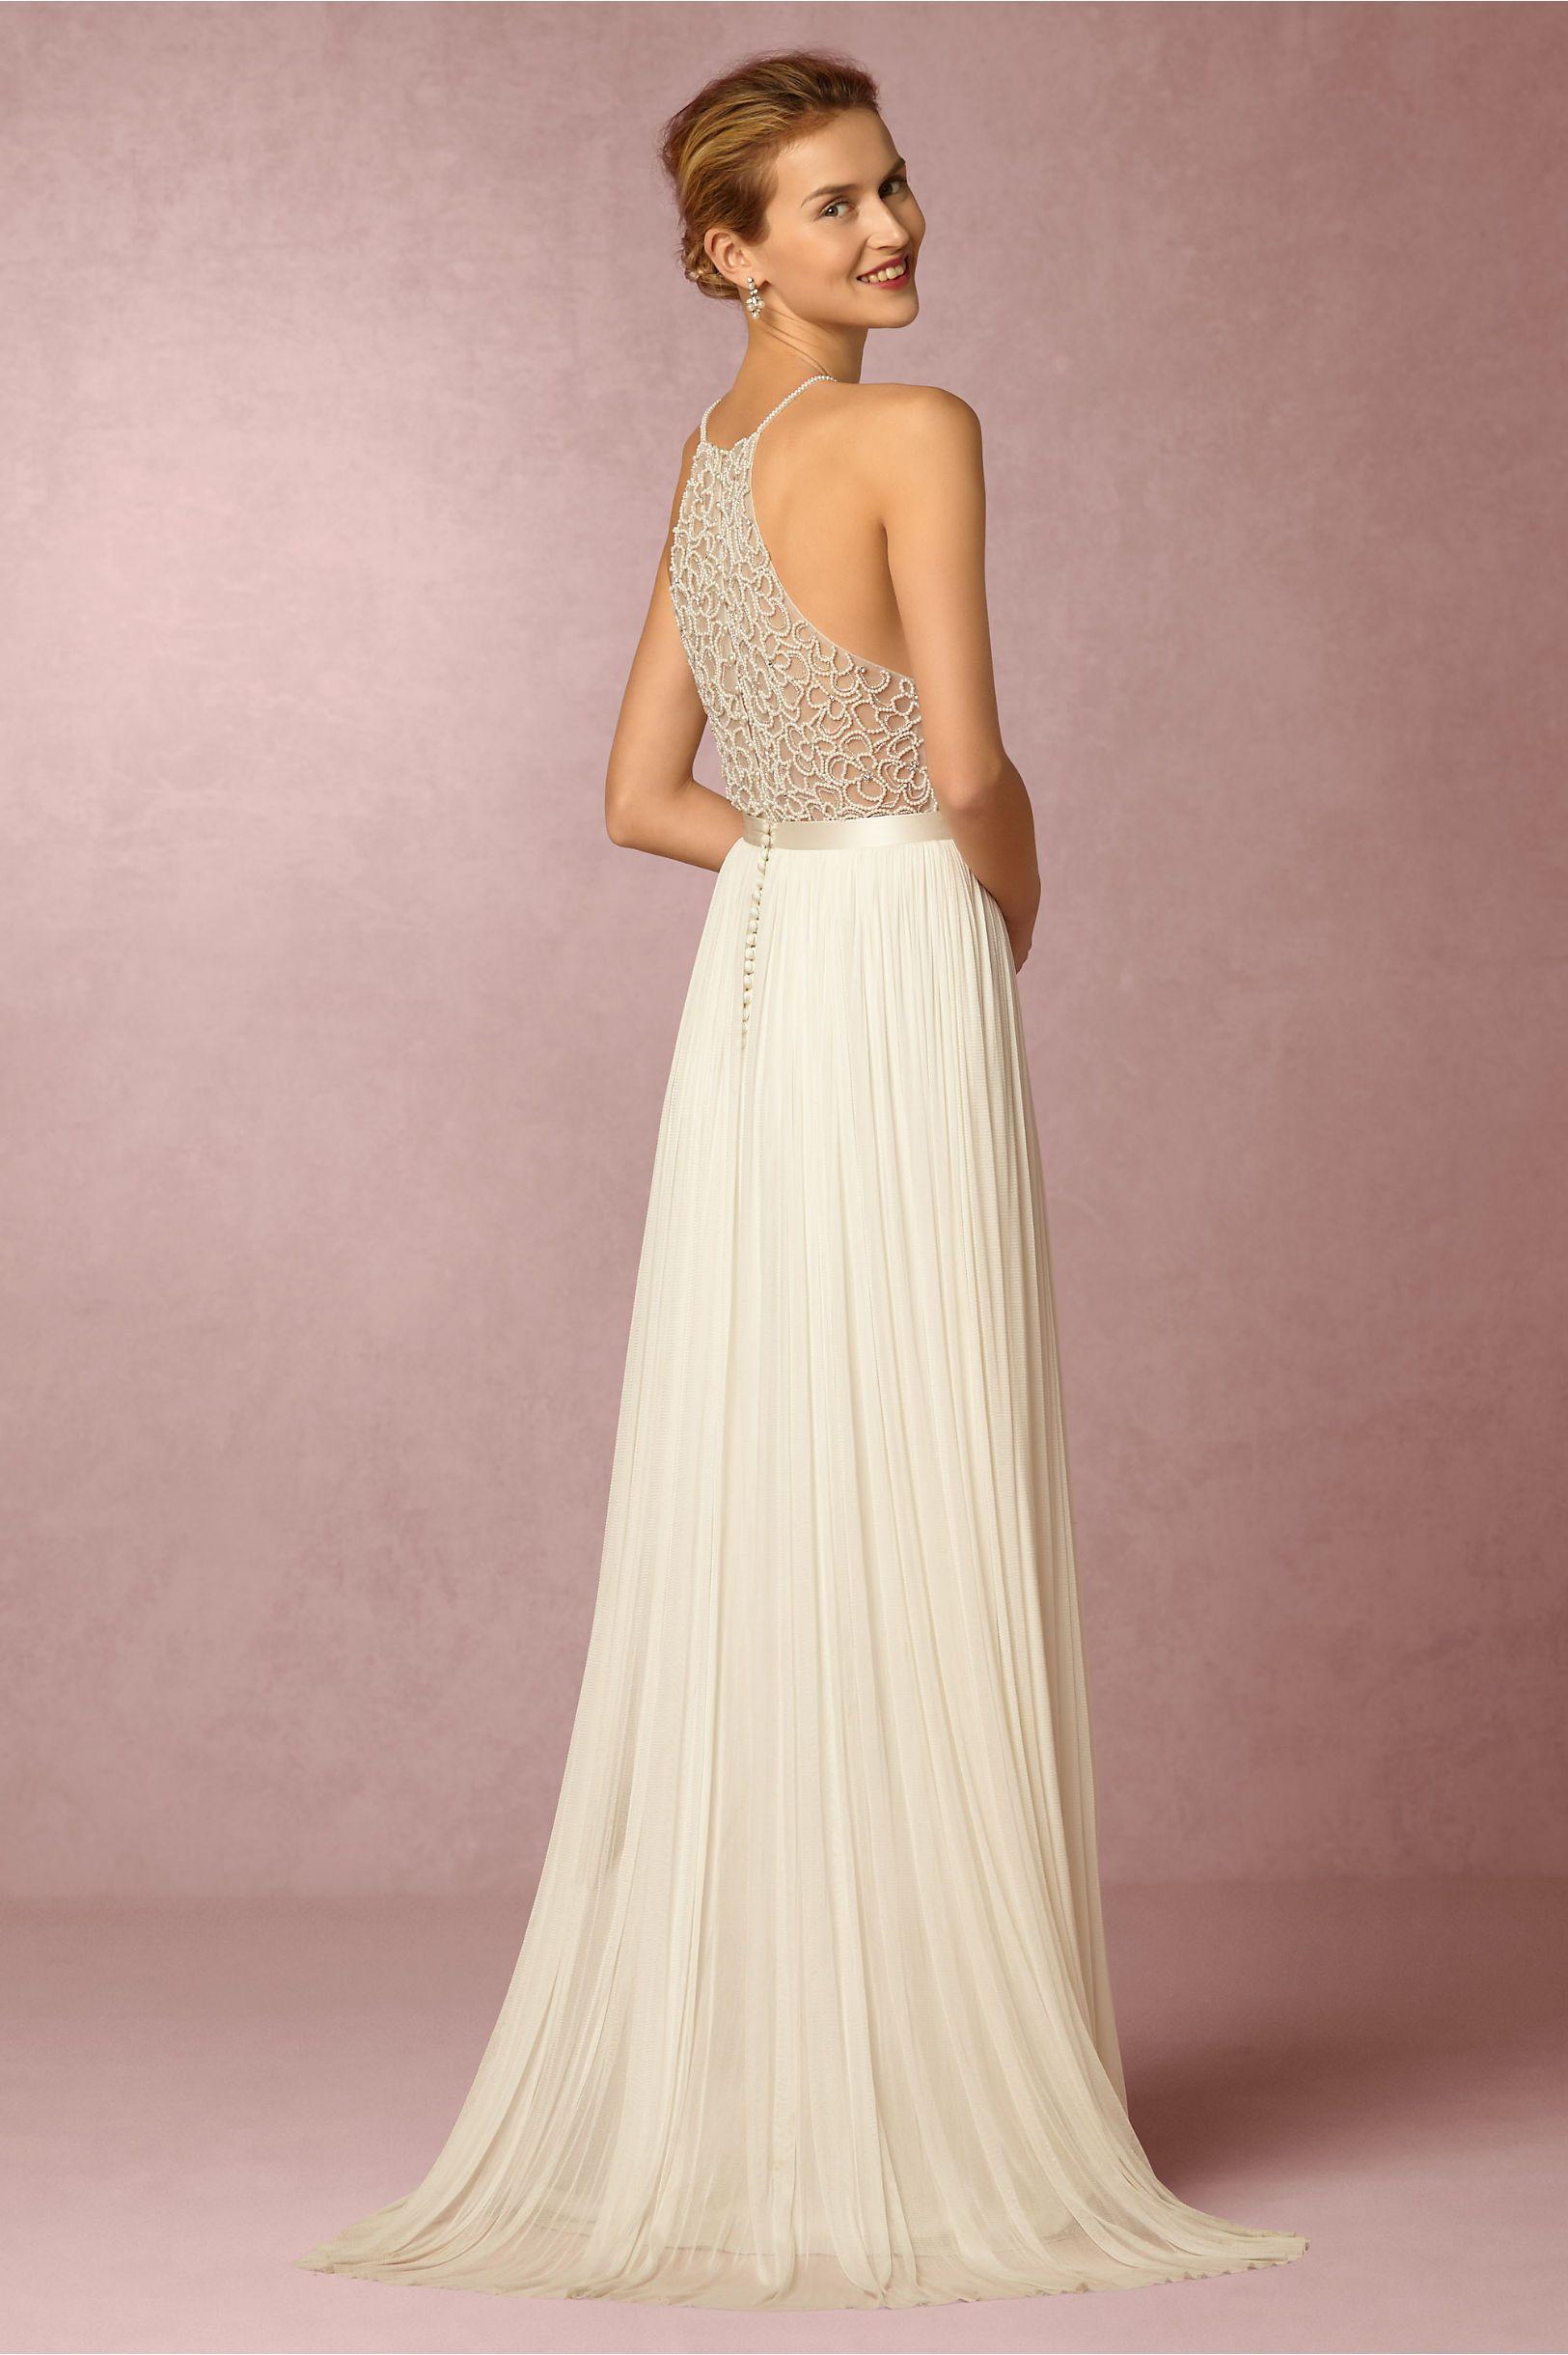 8e86e441ecd BHLDN Ashlyn Top   Anika Tulle Skirt in Bride Bridal Separates at BHLDN